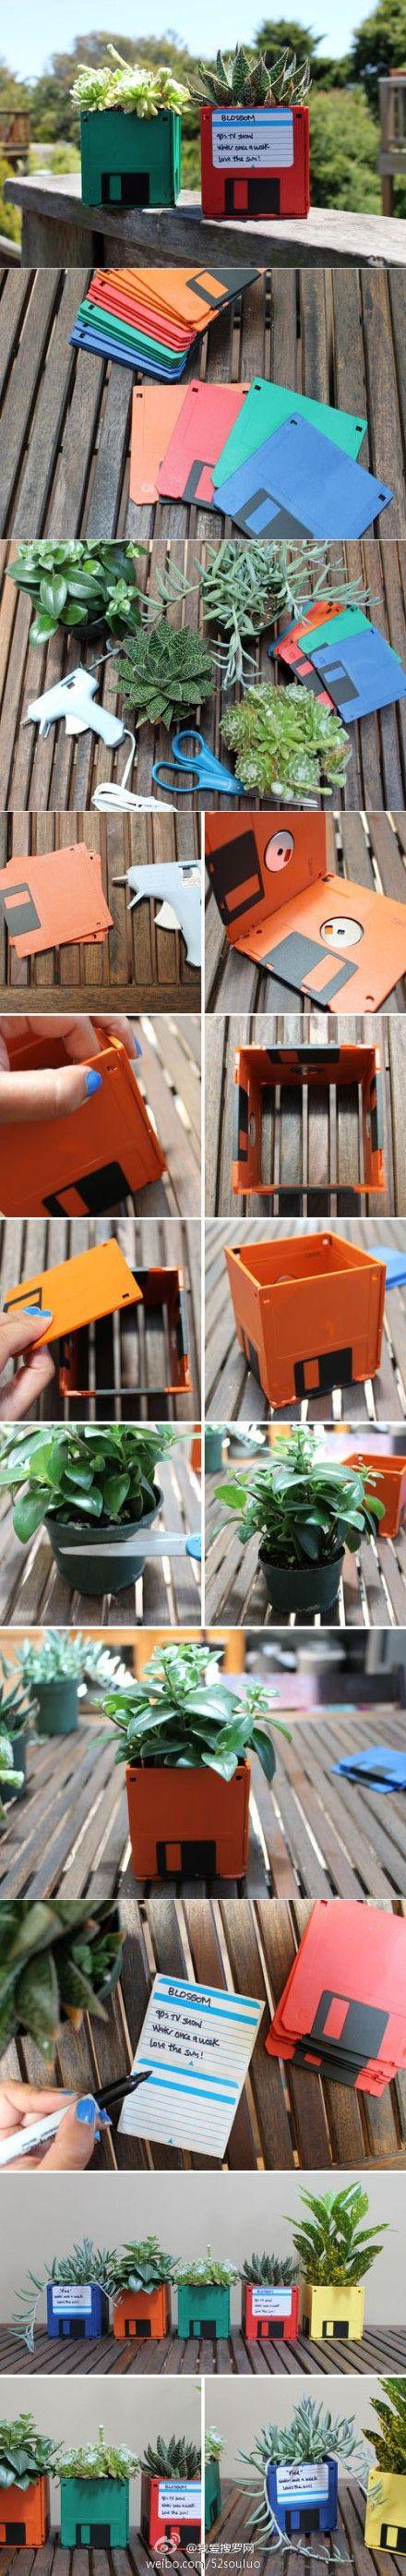 DIY Floppy Disk Planter